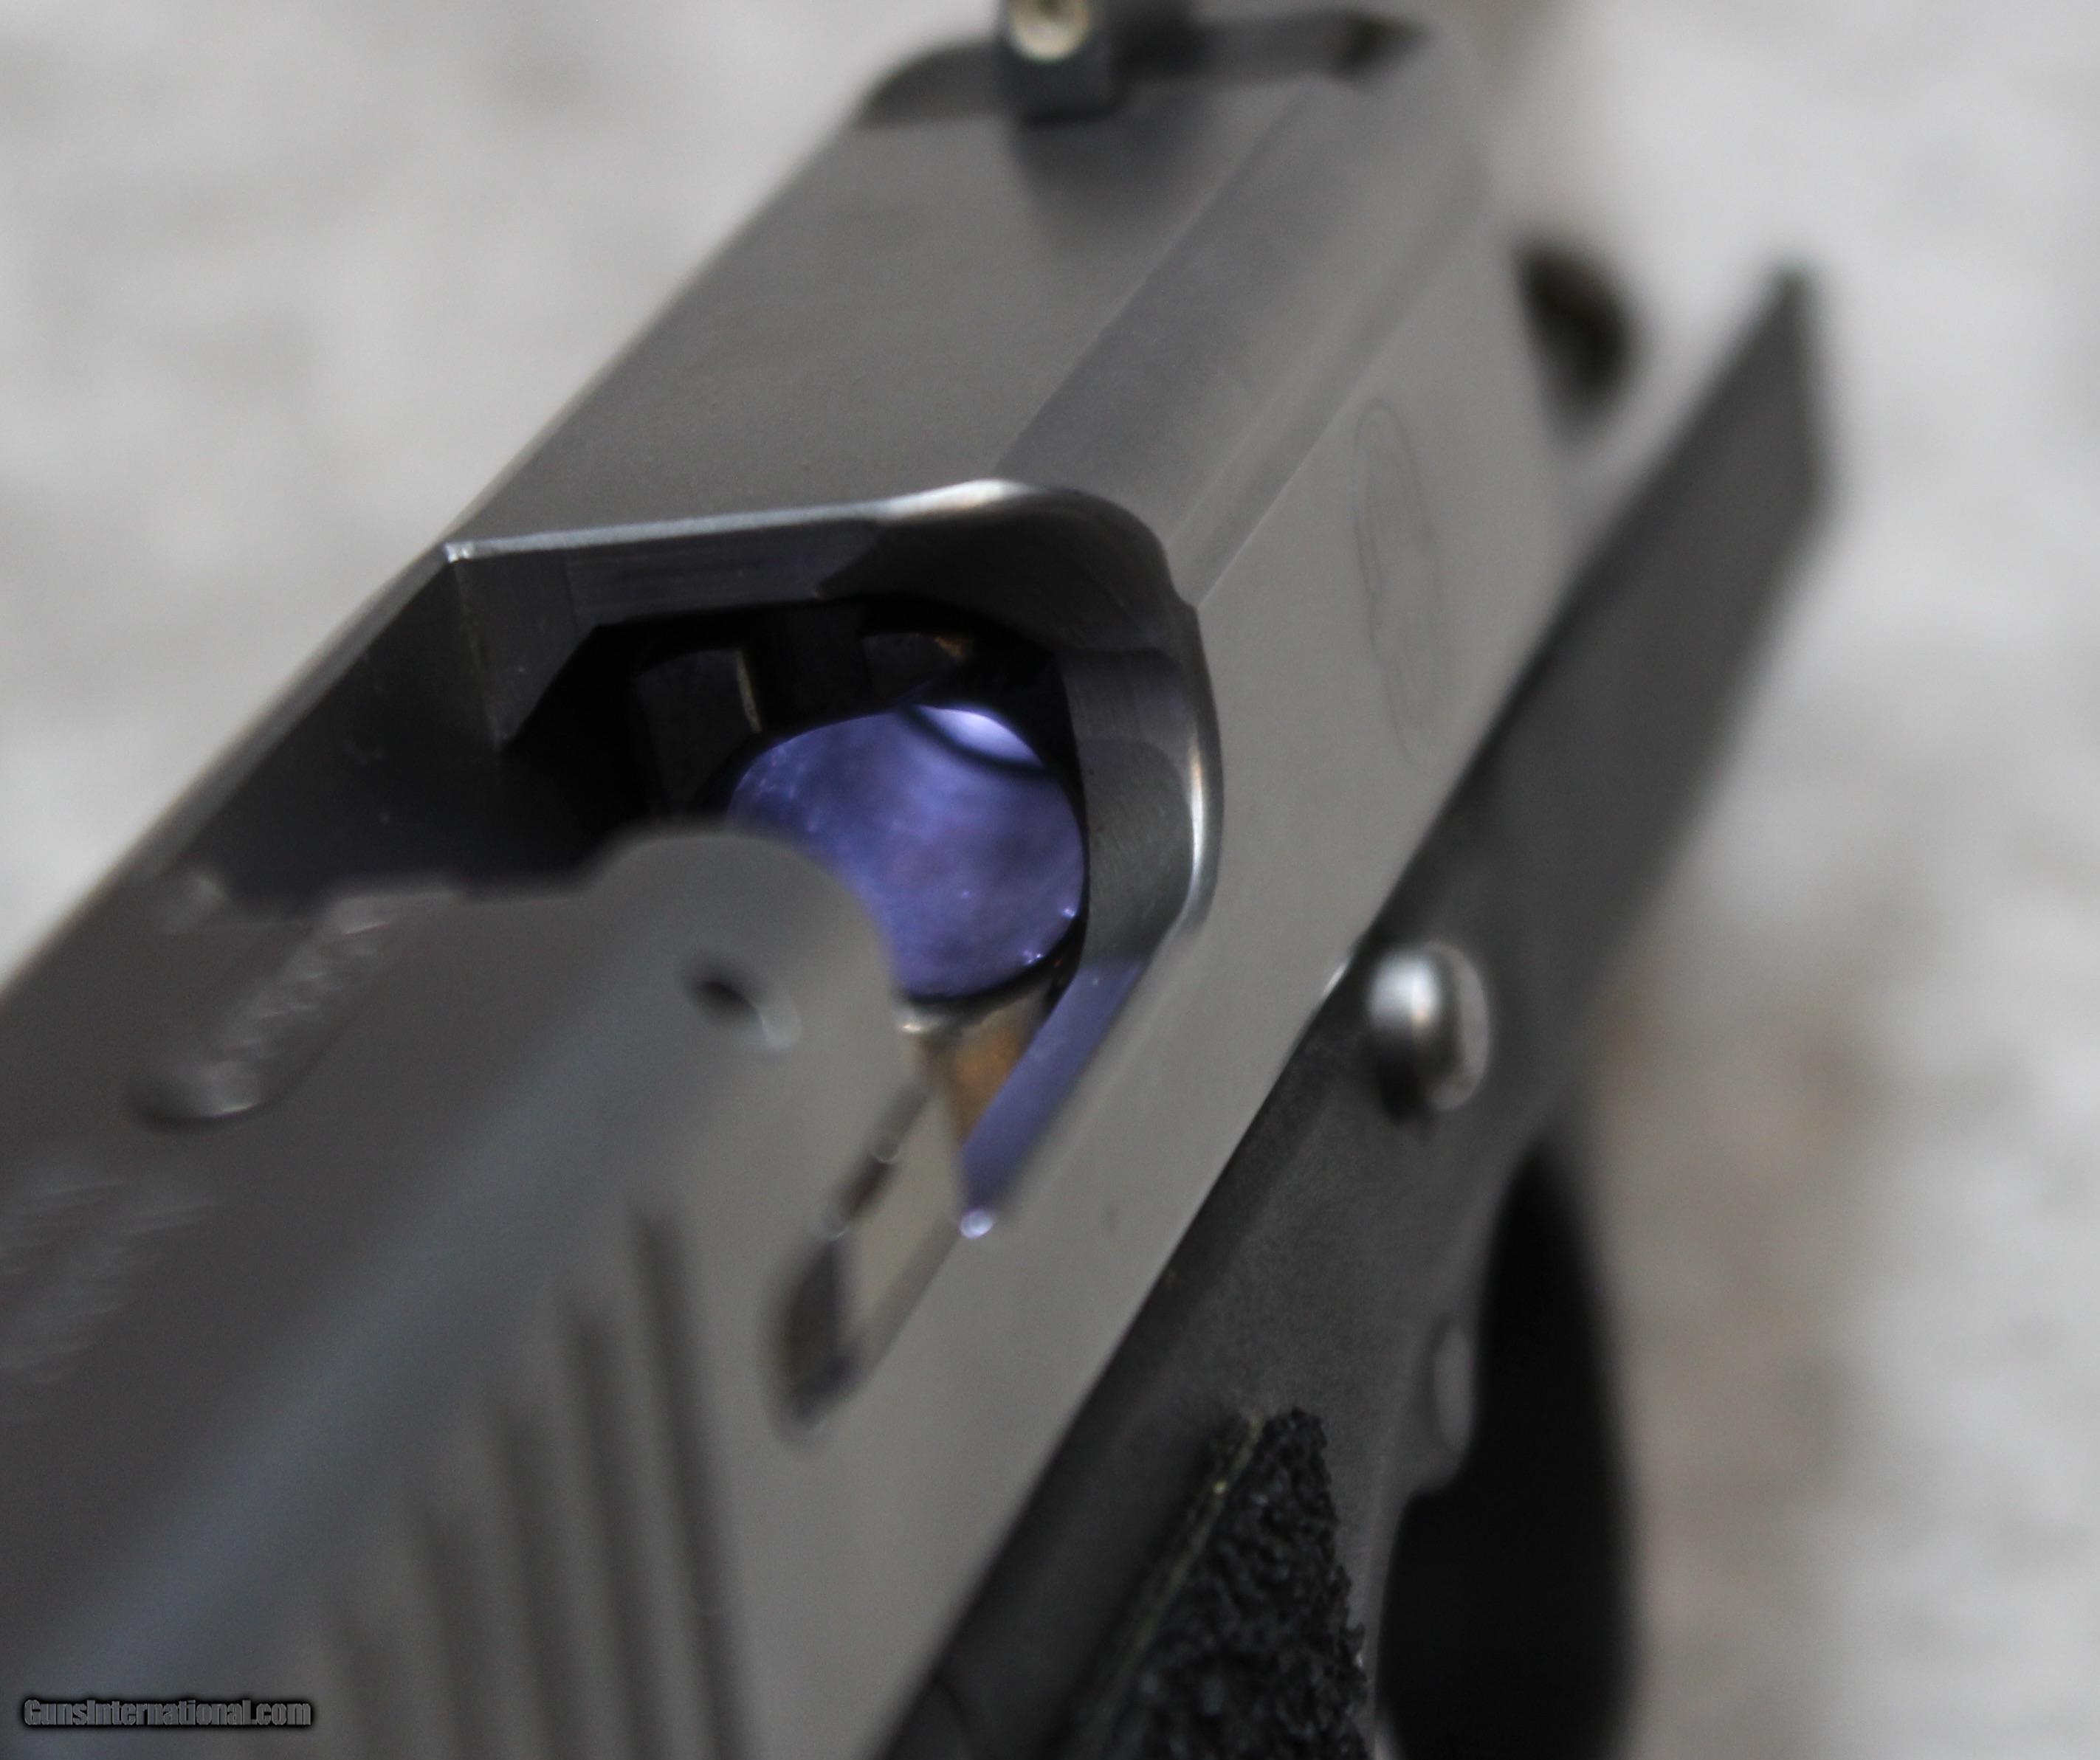 Cylinder & Slide Kahr PM9 9mm Custom Level II/III with 3